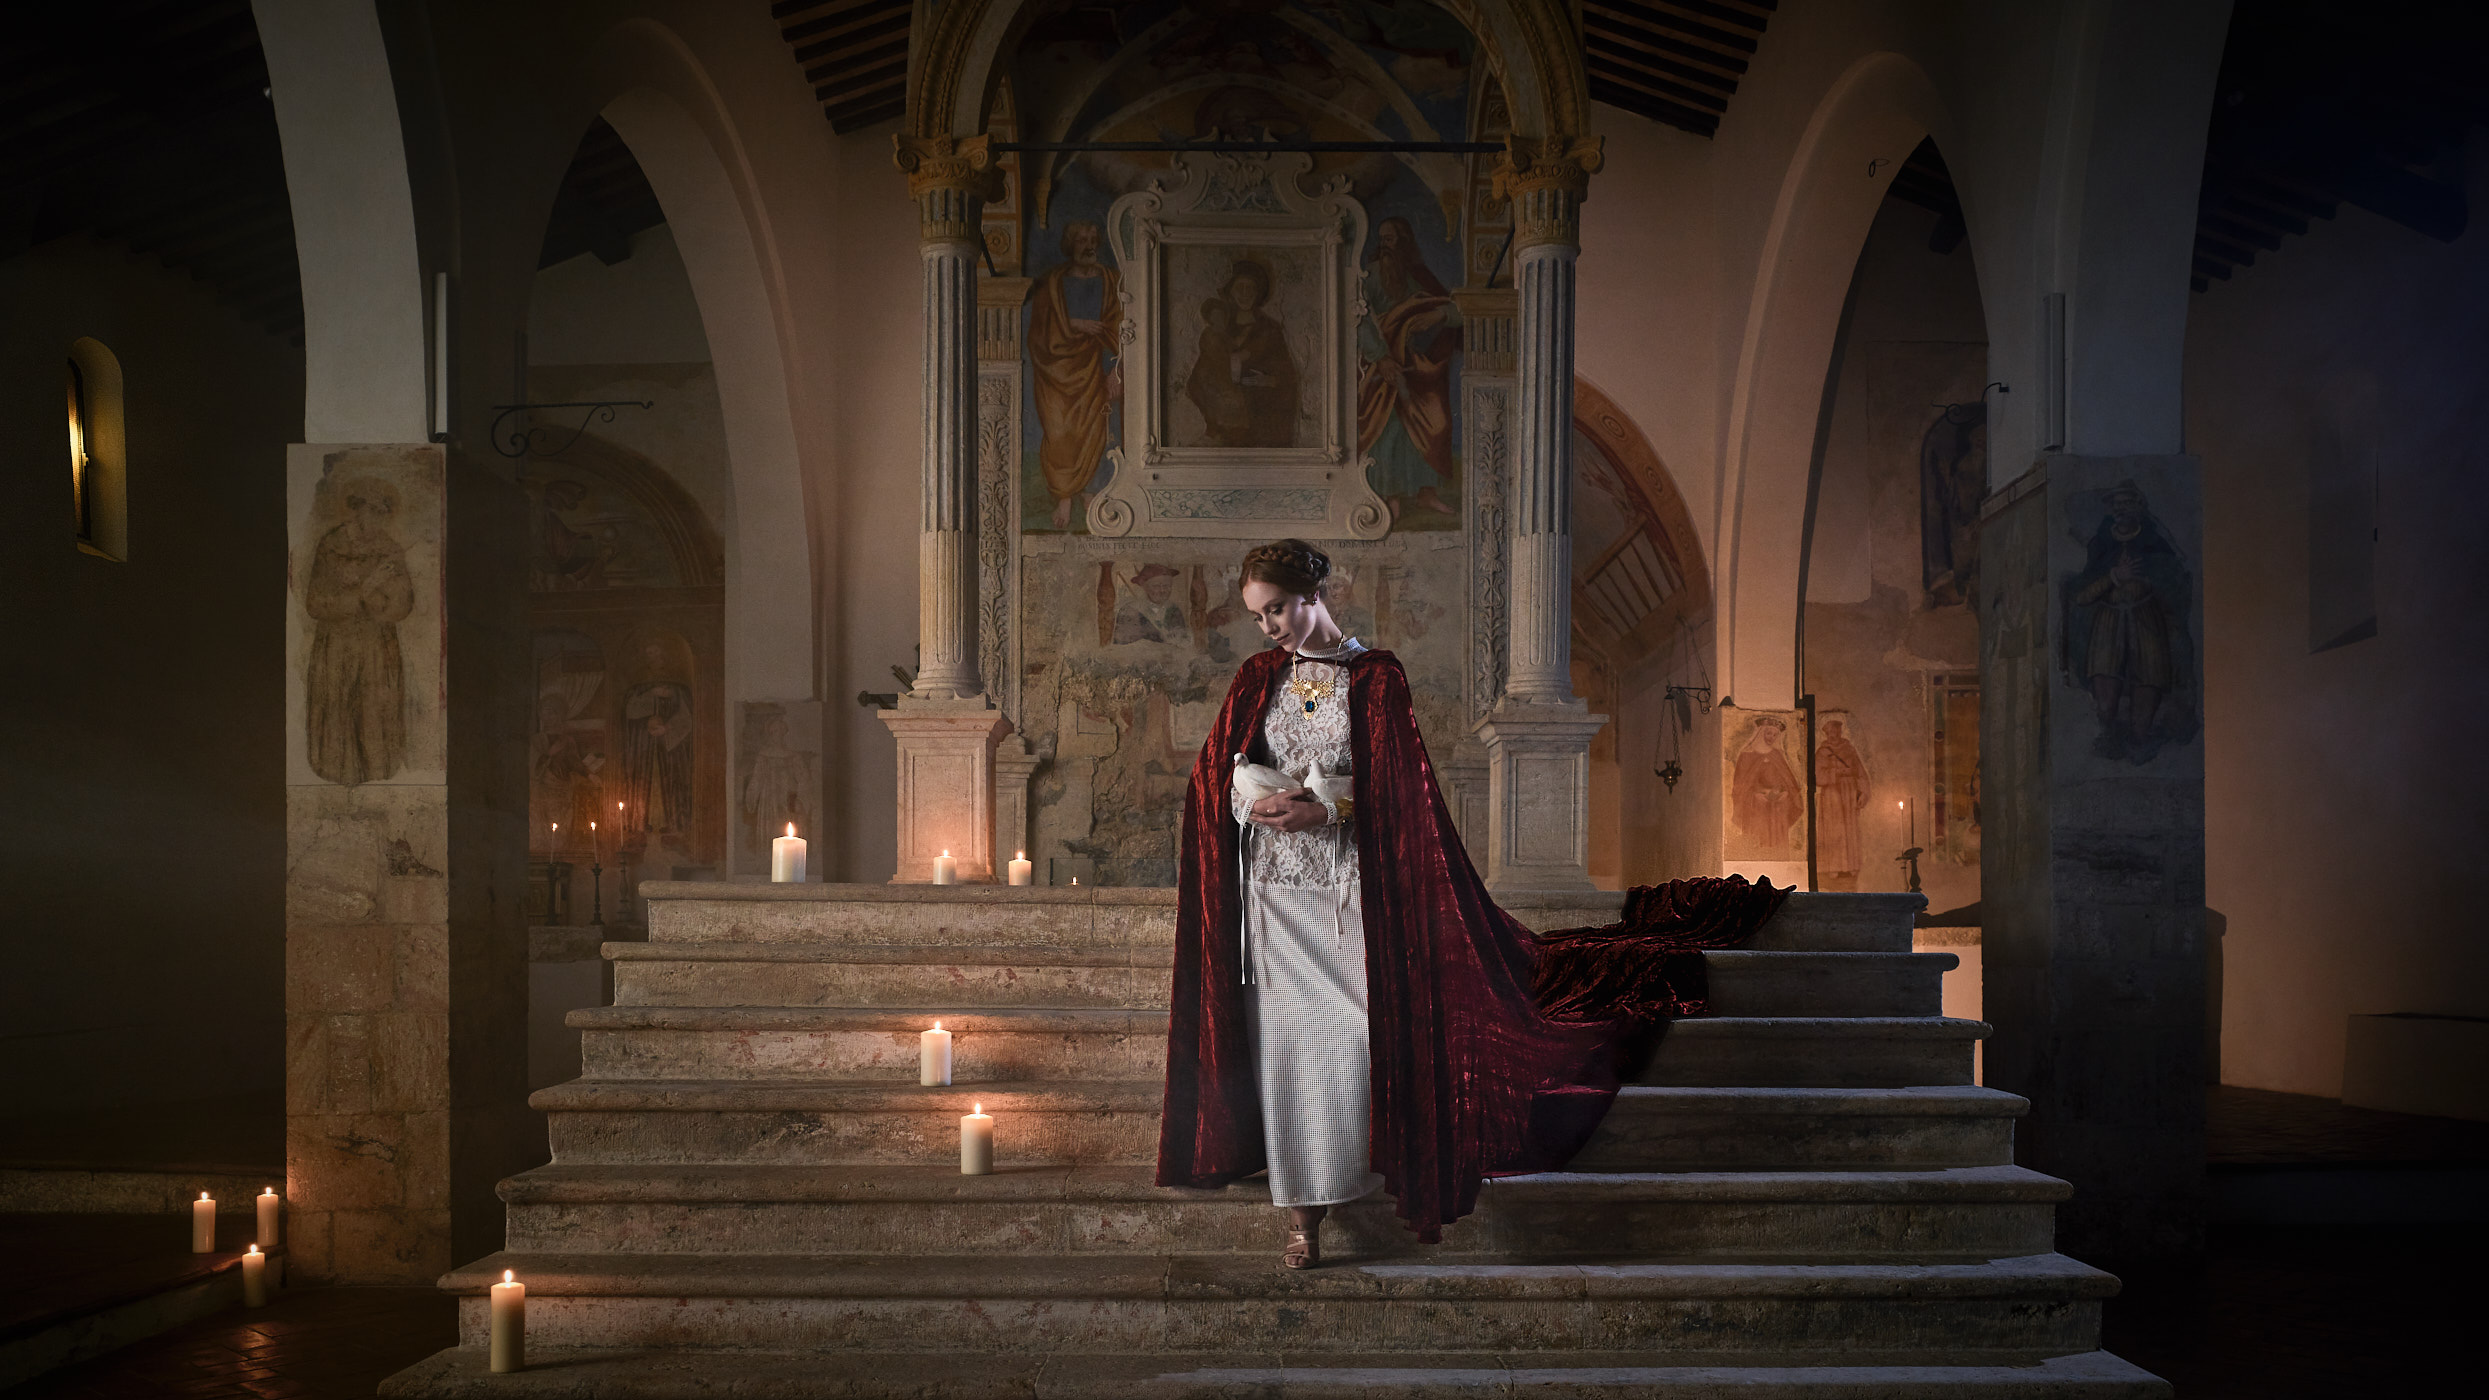 Virgin or Semiramidis? Fonteverde IHC. Tuscany.